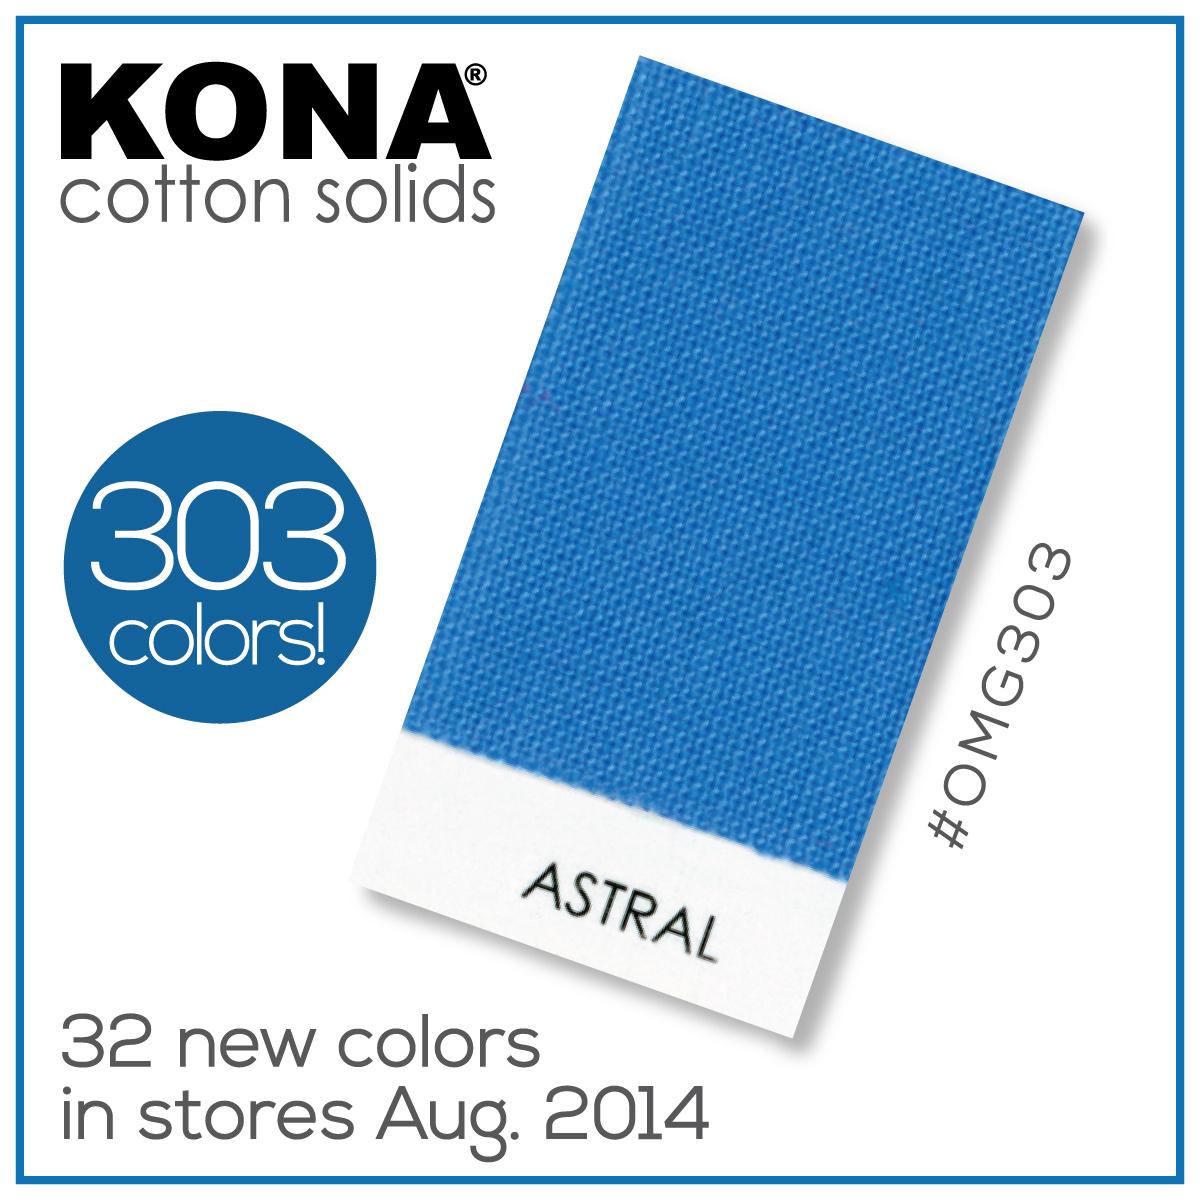 Kona-Astral.jpg